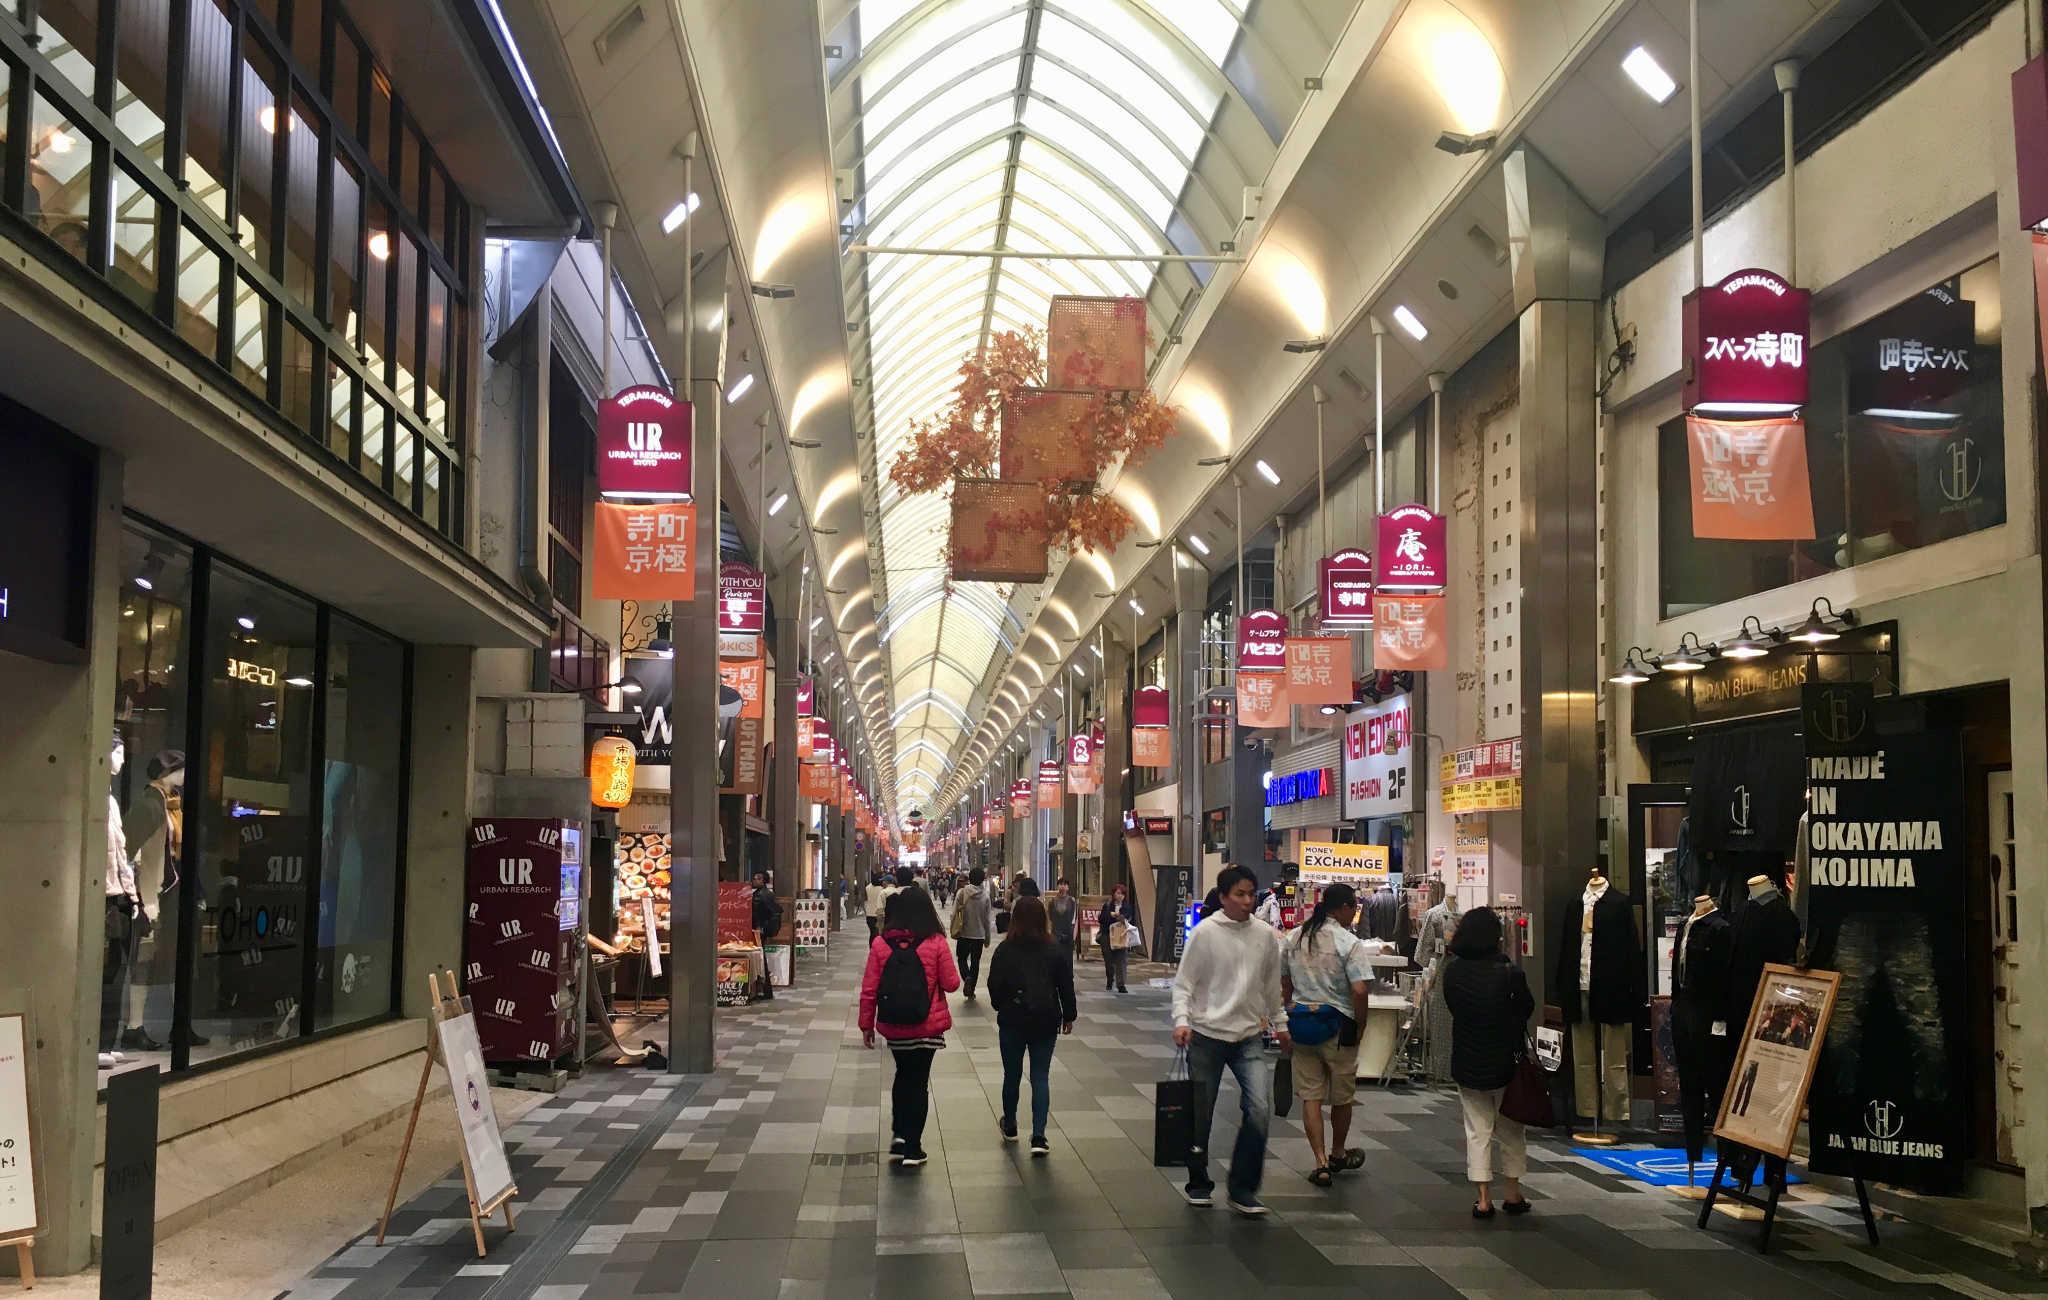 Teramachi et Shinkyogoku, les arcades commerçantes de Kyoto